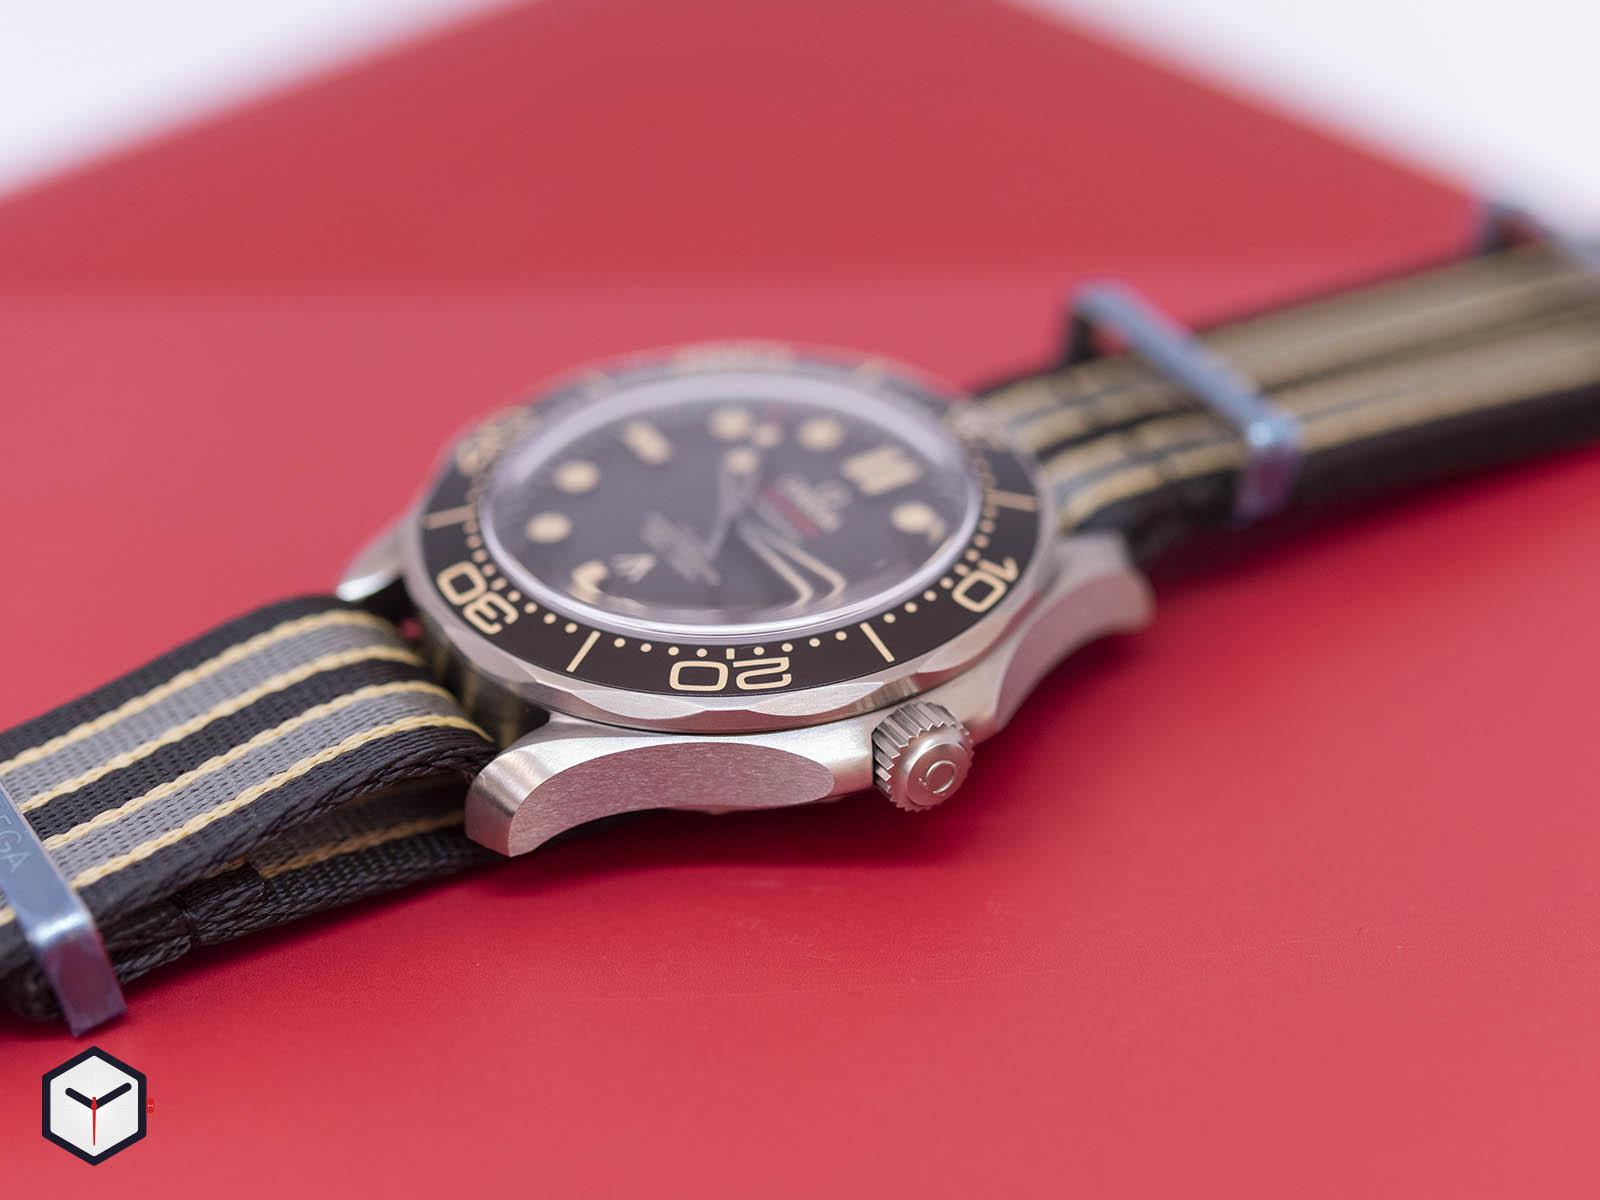 210-92-42-20-01-001-omega-seamaster-diver-300m-007-edition-4.jpg